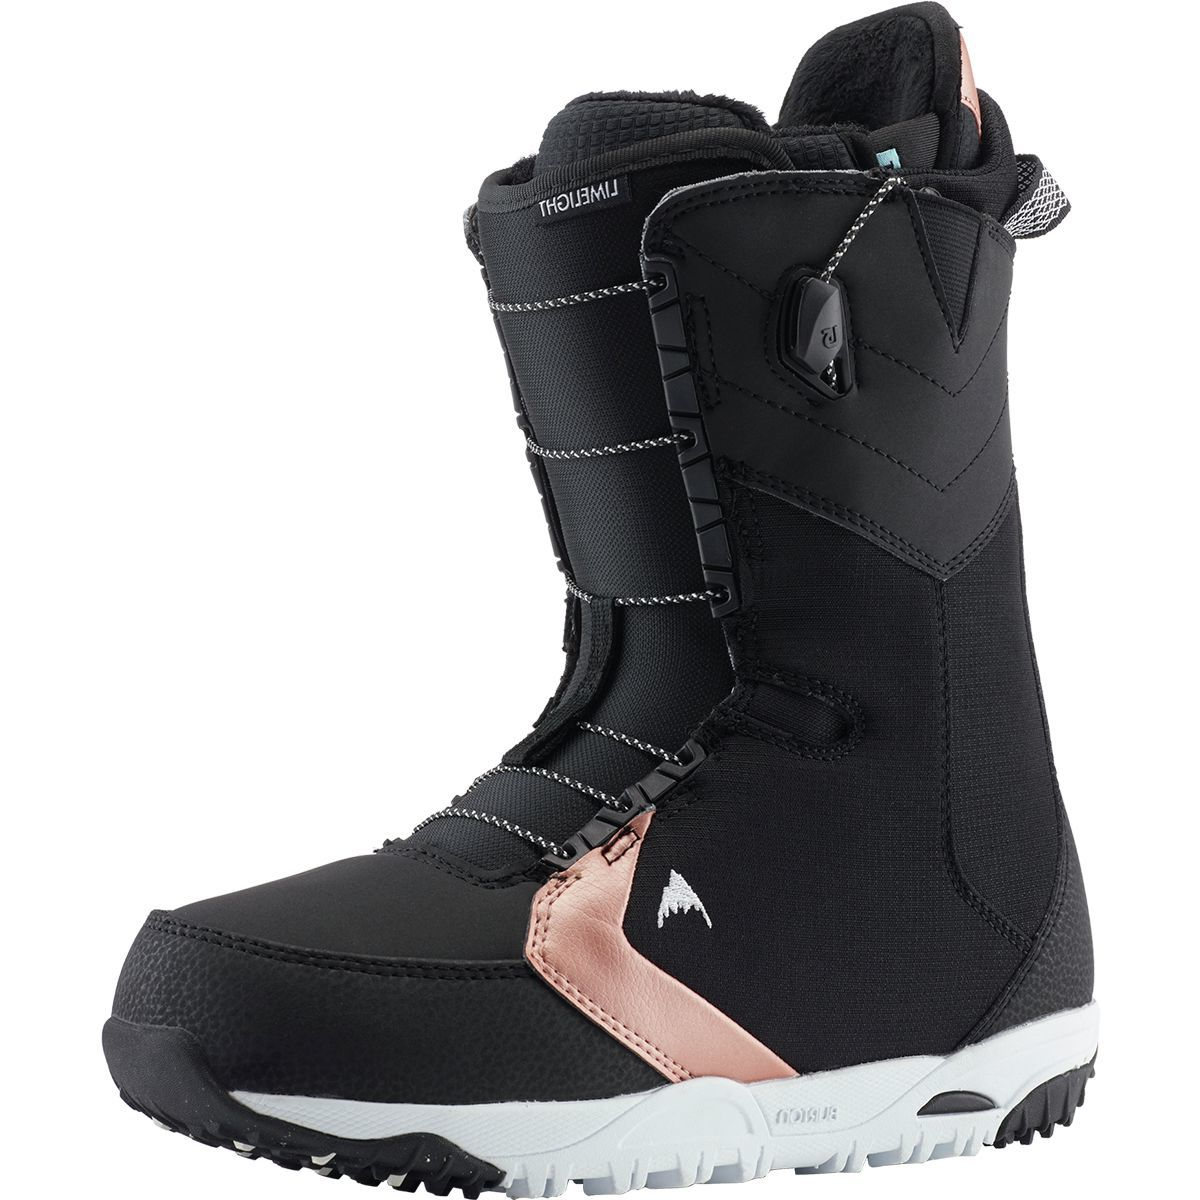 Burton Limelight Snowboard Boot - Women's